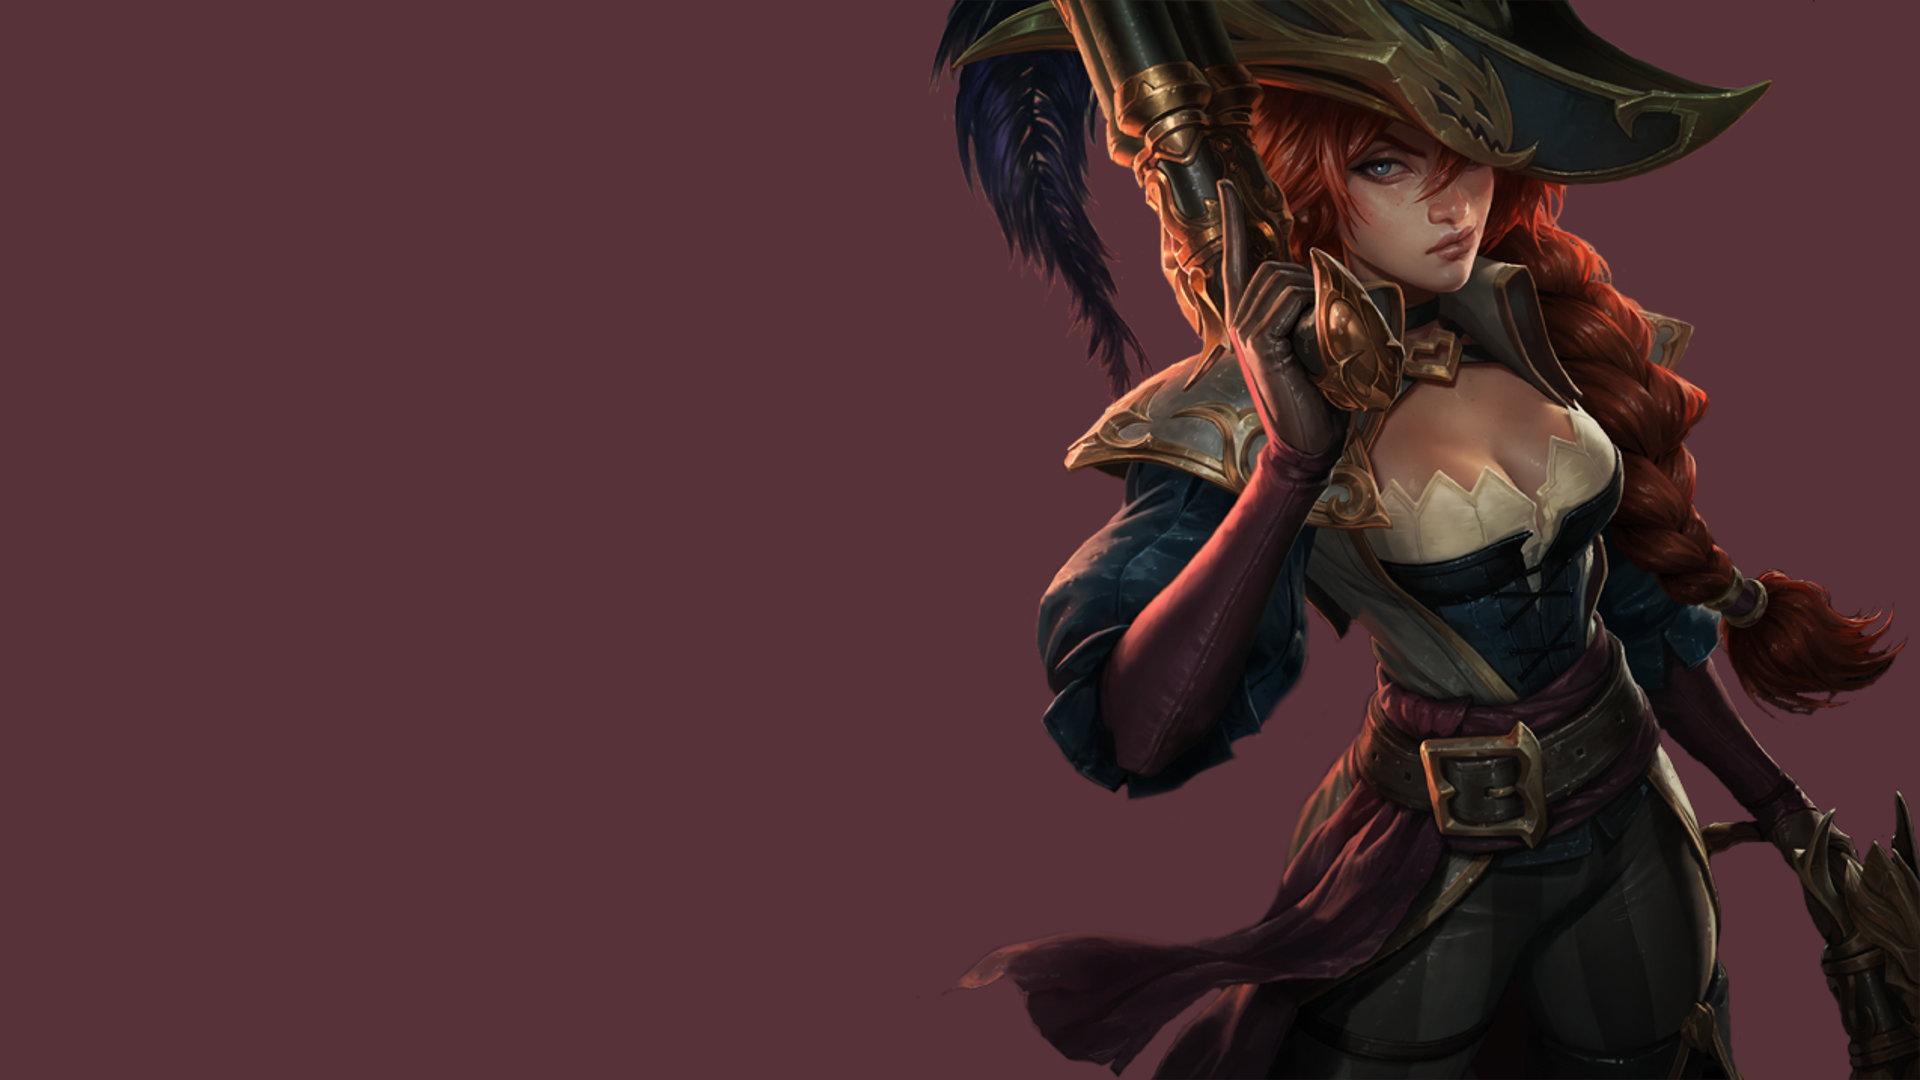 League Of Legends Miss Fortune Wallpaper: Miss Fortune (League Of Legends) Wallpapers HD For Desktop